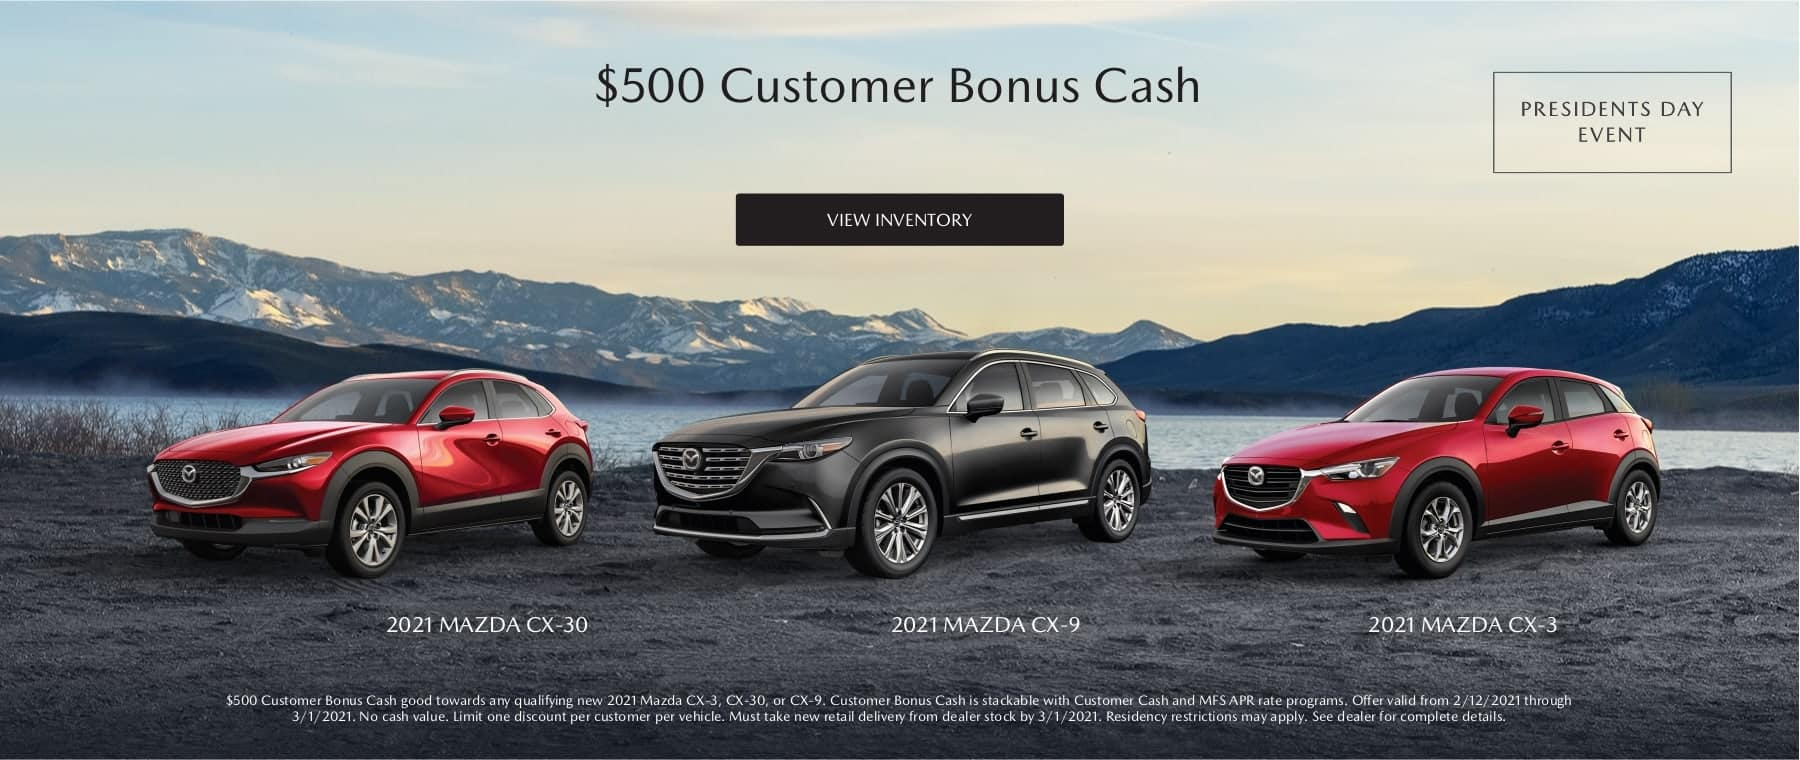 $500 Customer Bonus Cash